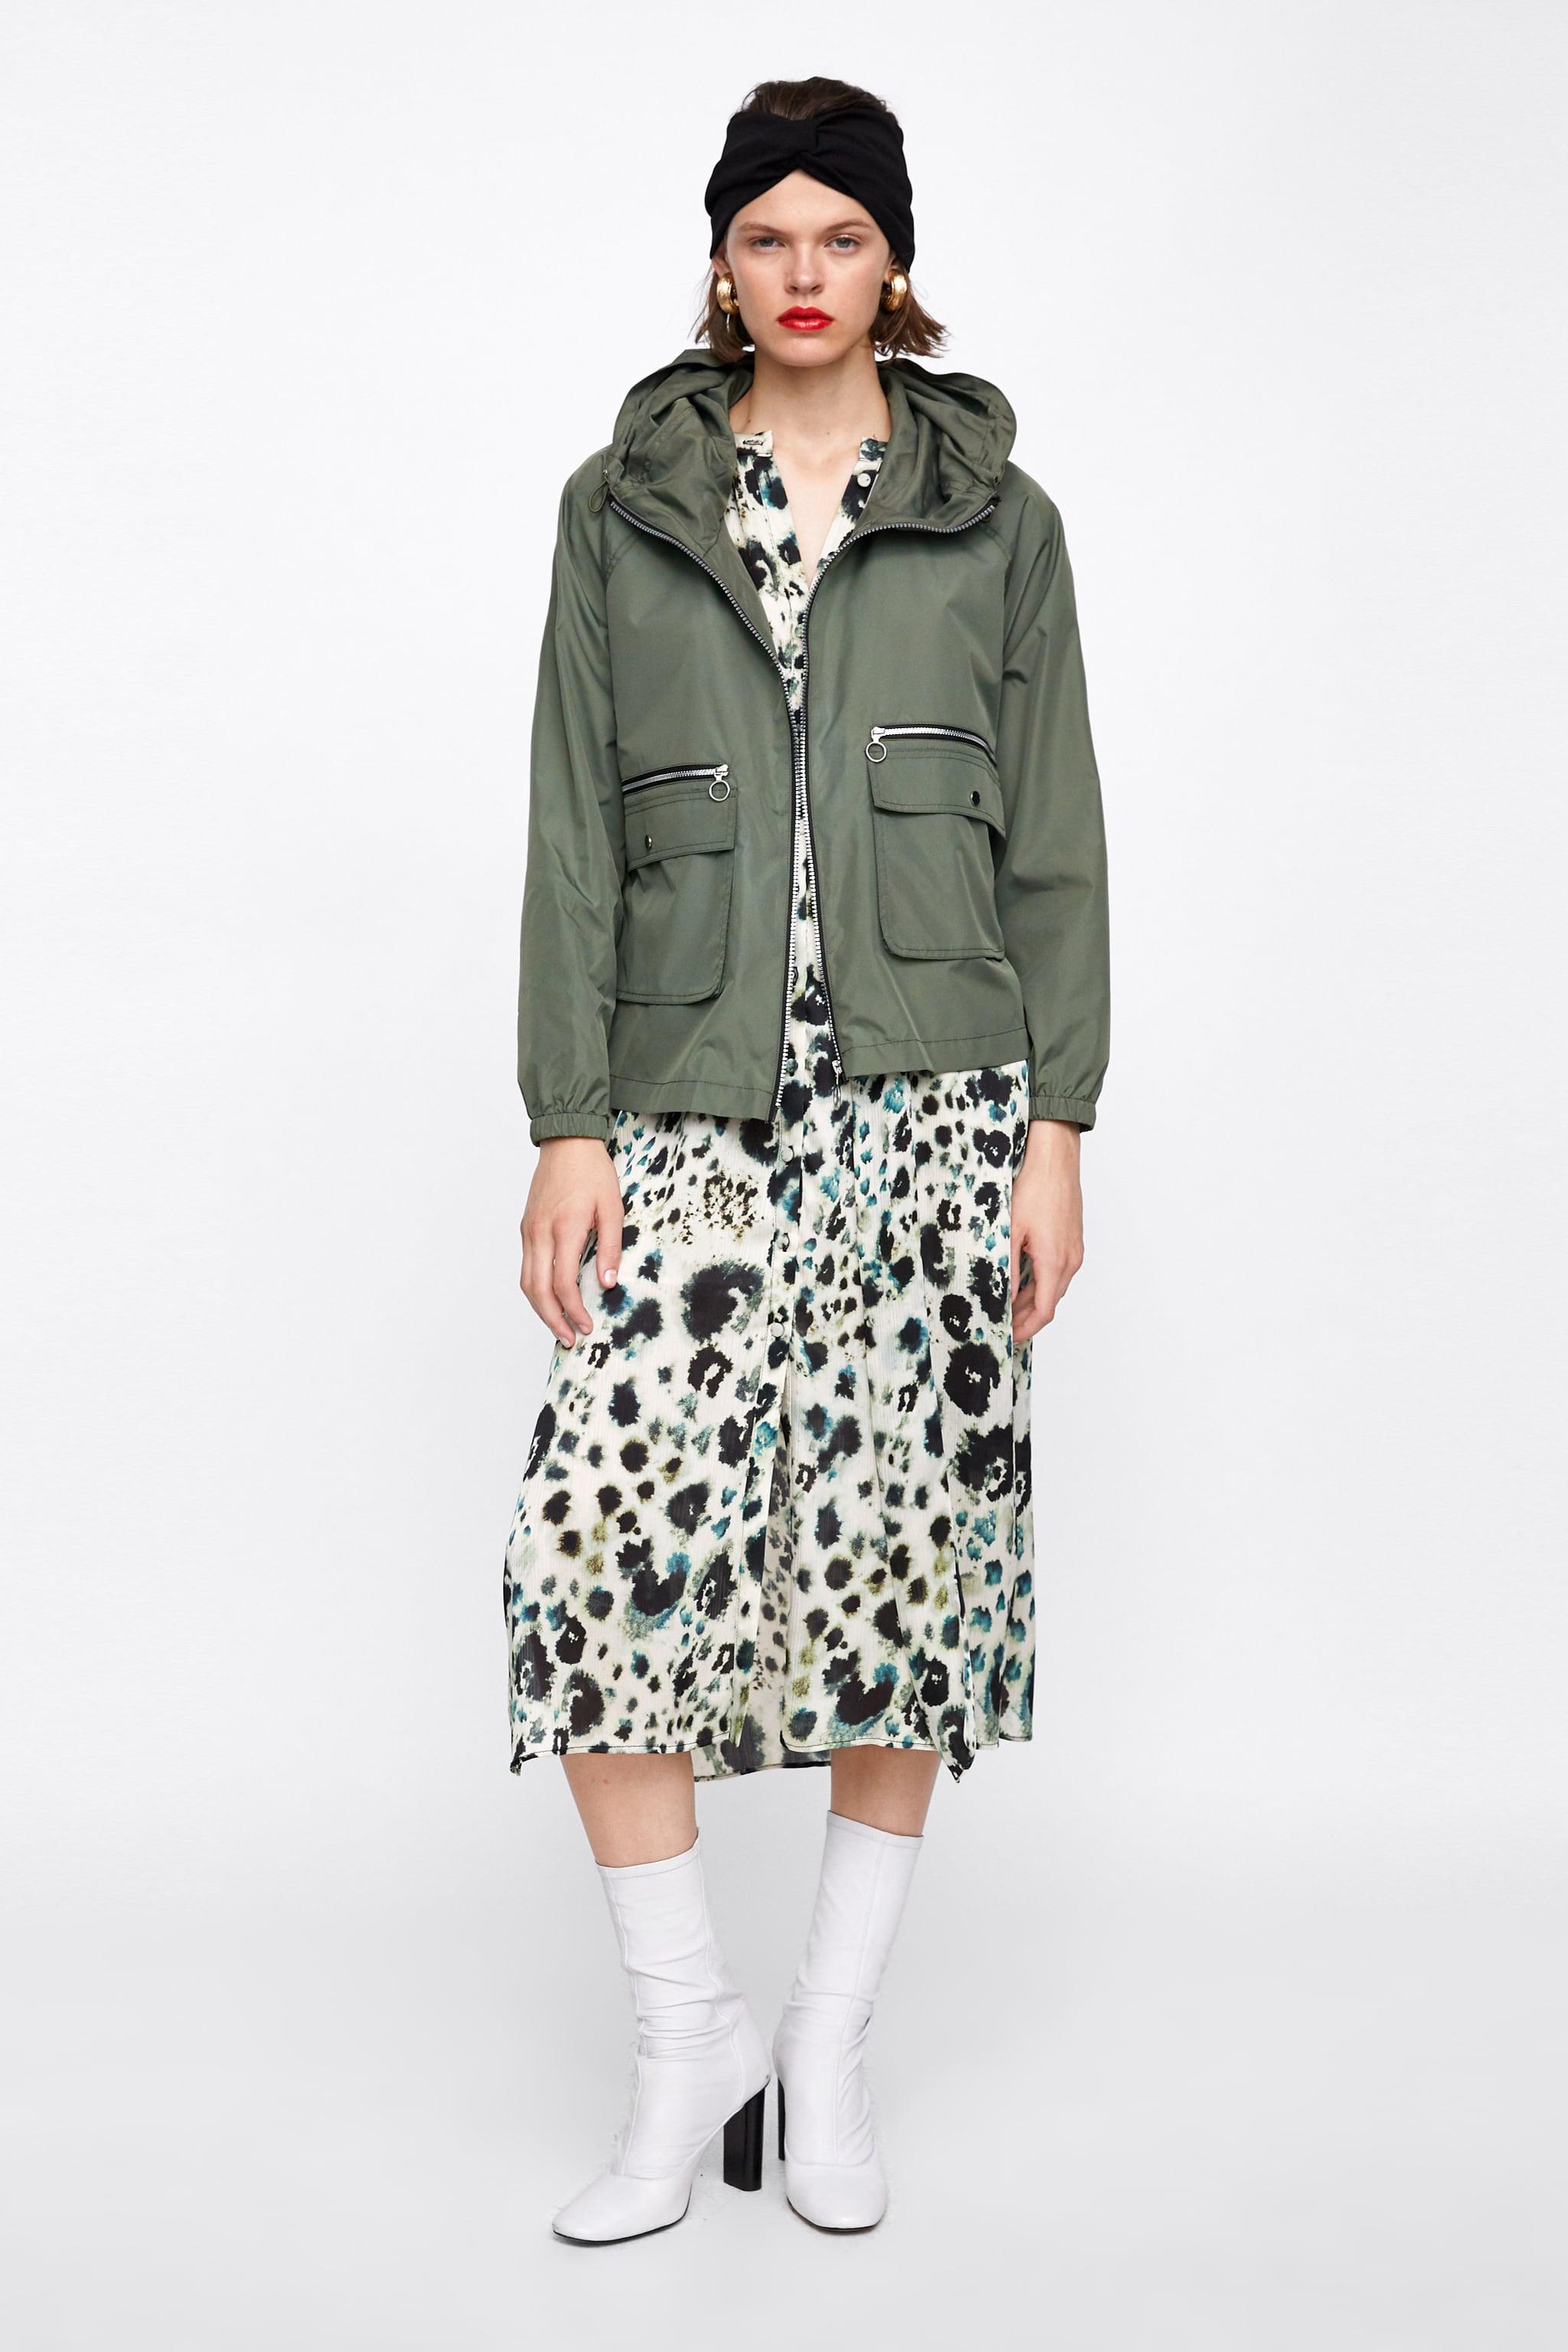 Ghirardelli Heels Bay Beige 36 Zara Zippered Raincoat